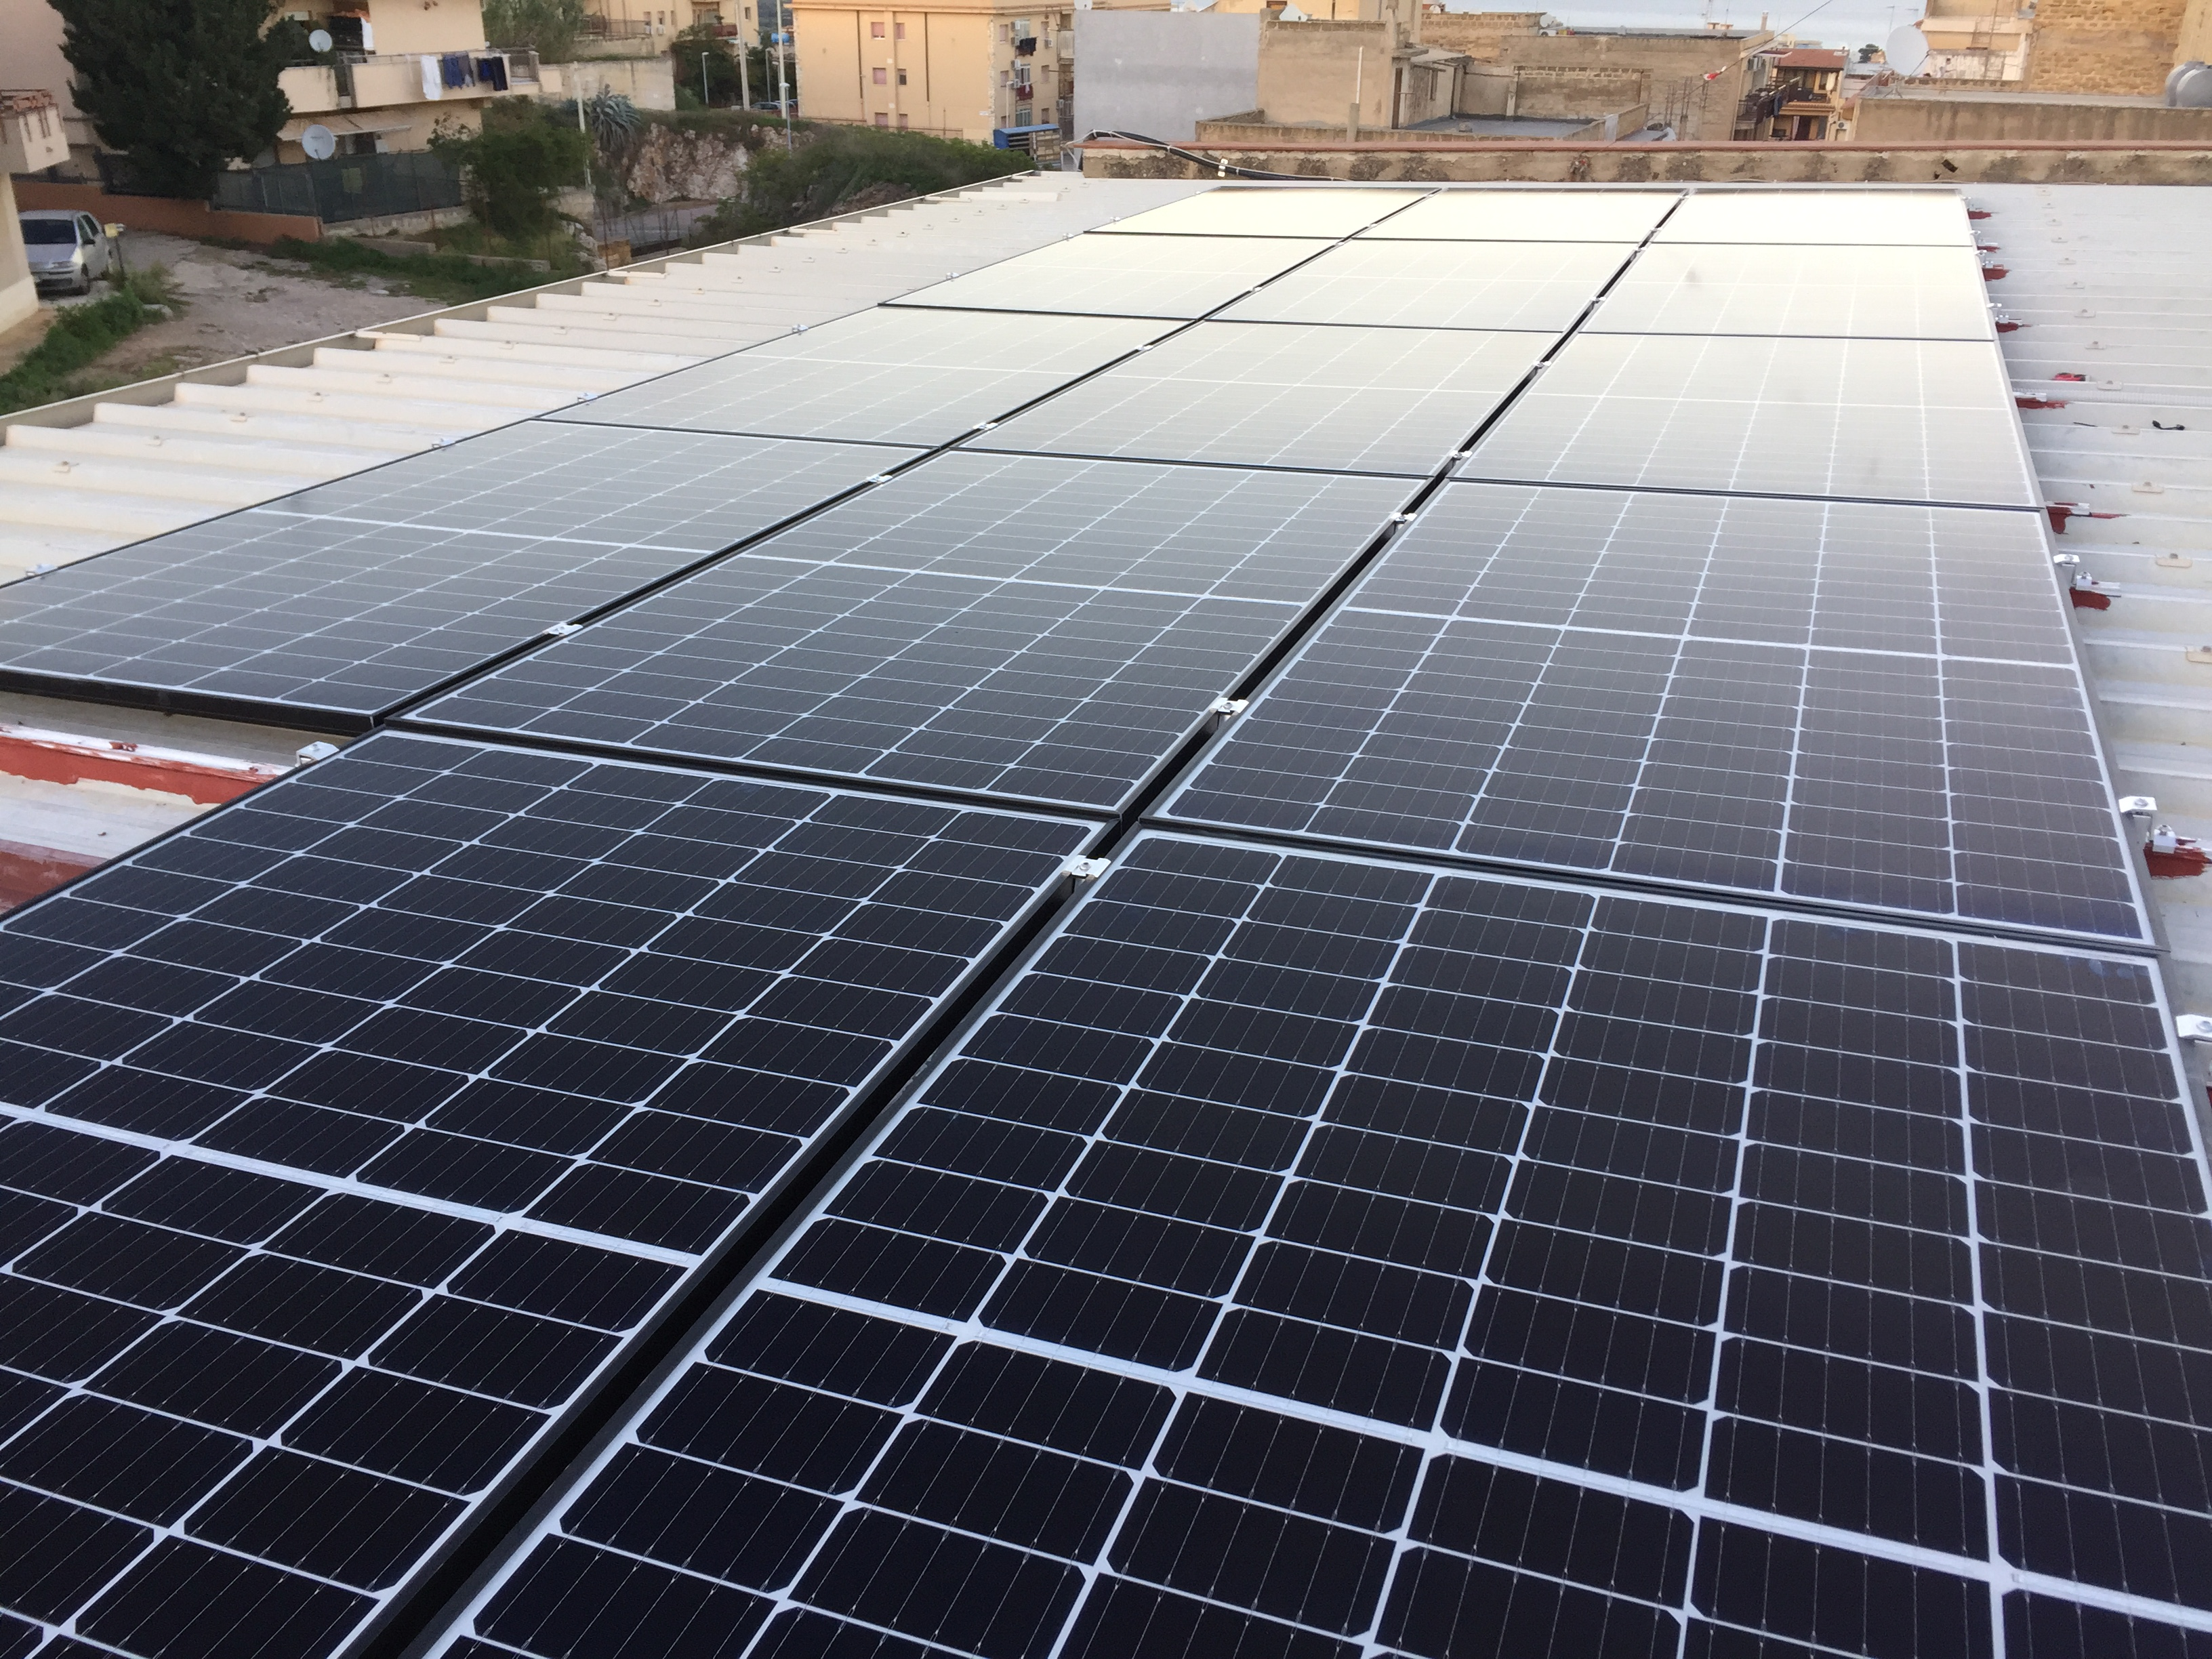 greco_energy_fotovoltaico_sicilia8